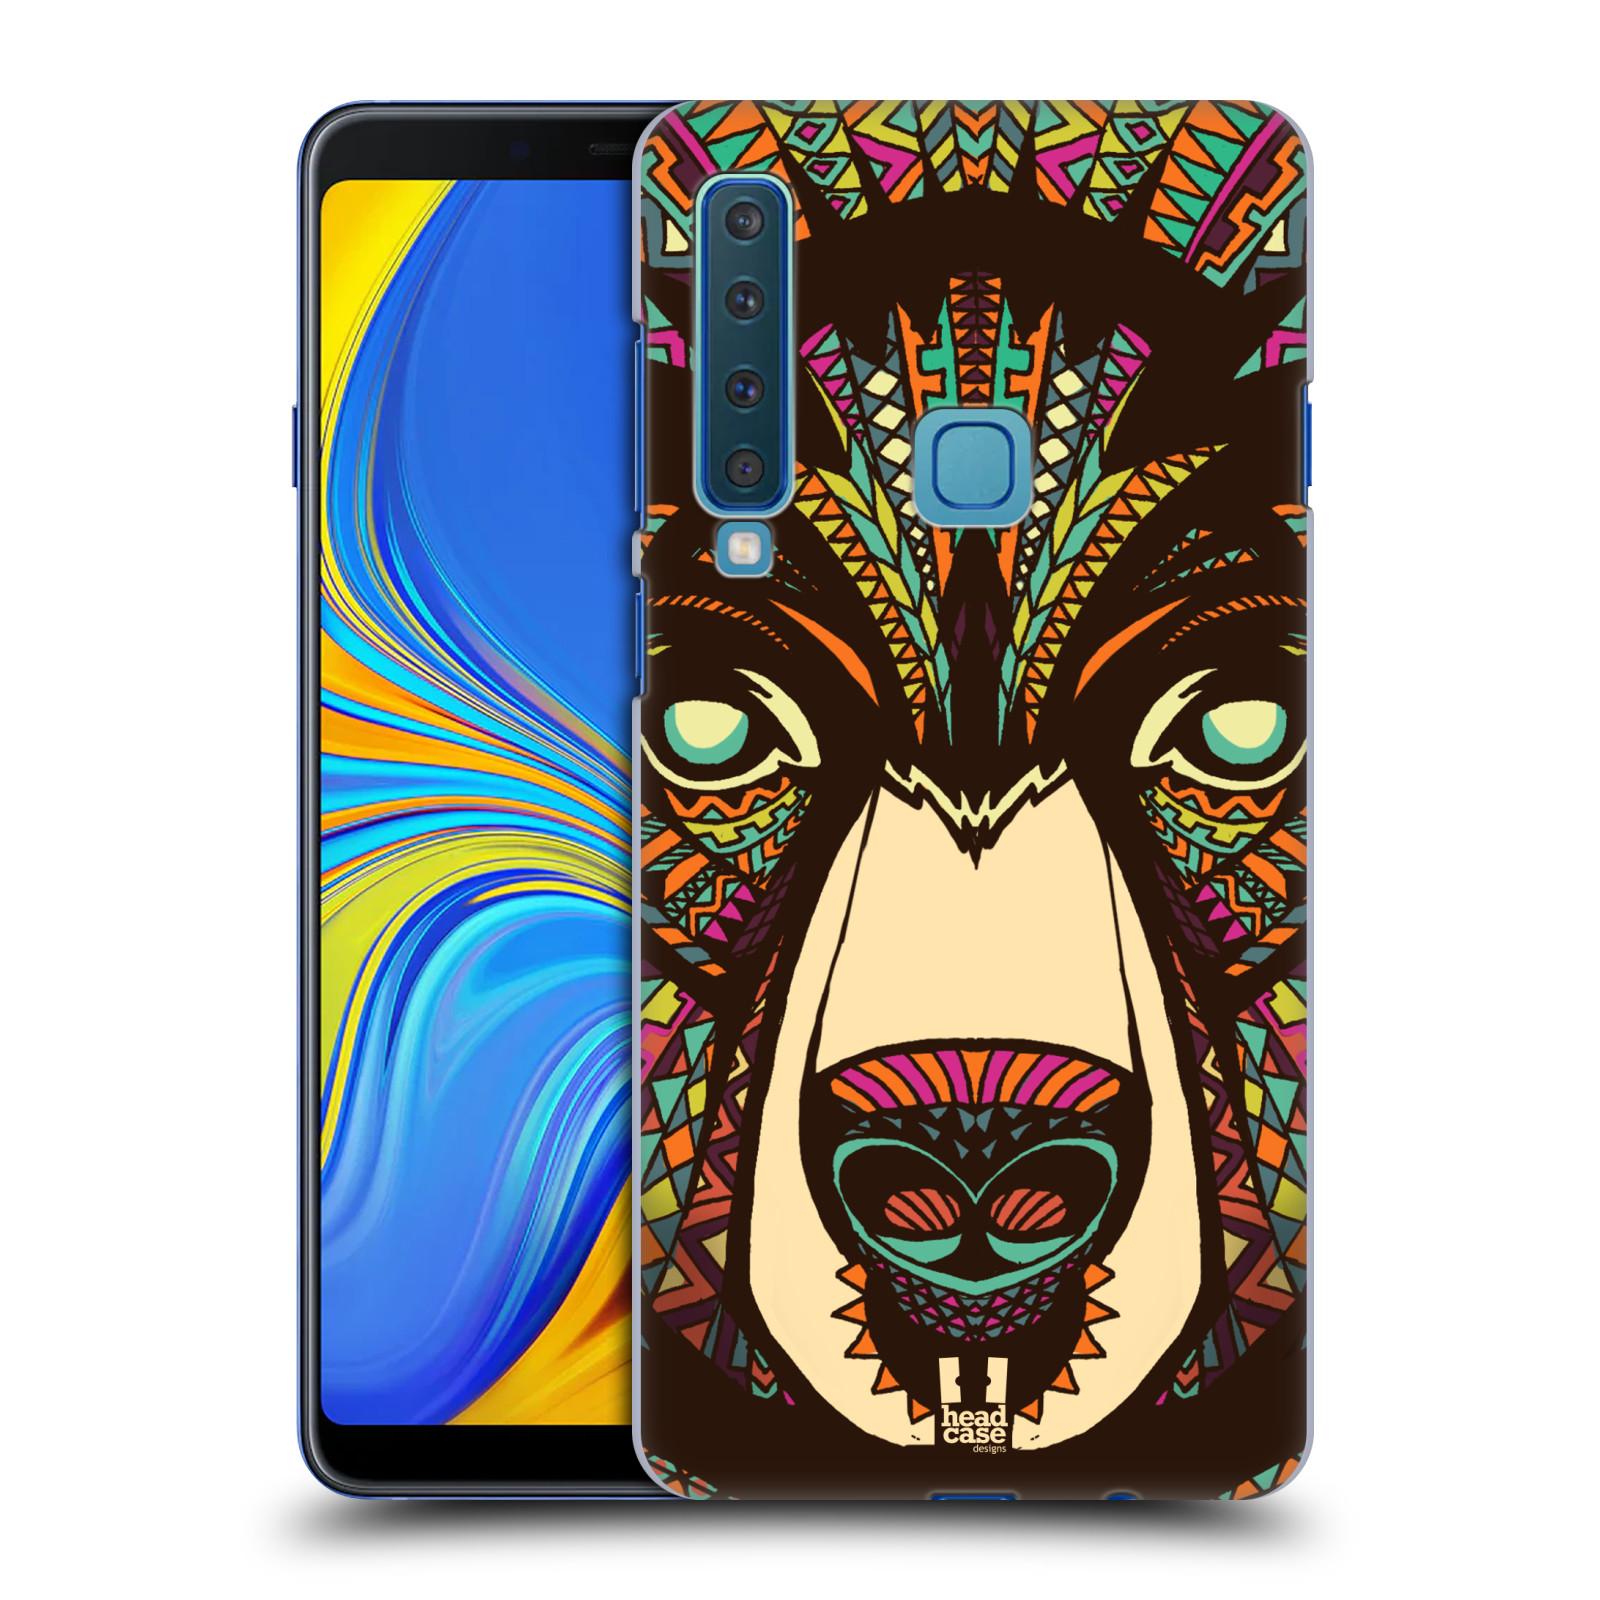 Plastové pouzdro na mobil Samsung Galaxy A9 (2018) - Head Case - AZTEC MEDVĚD